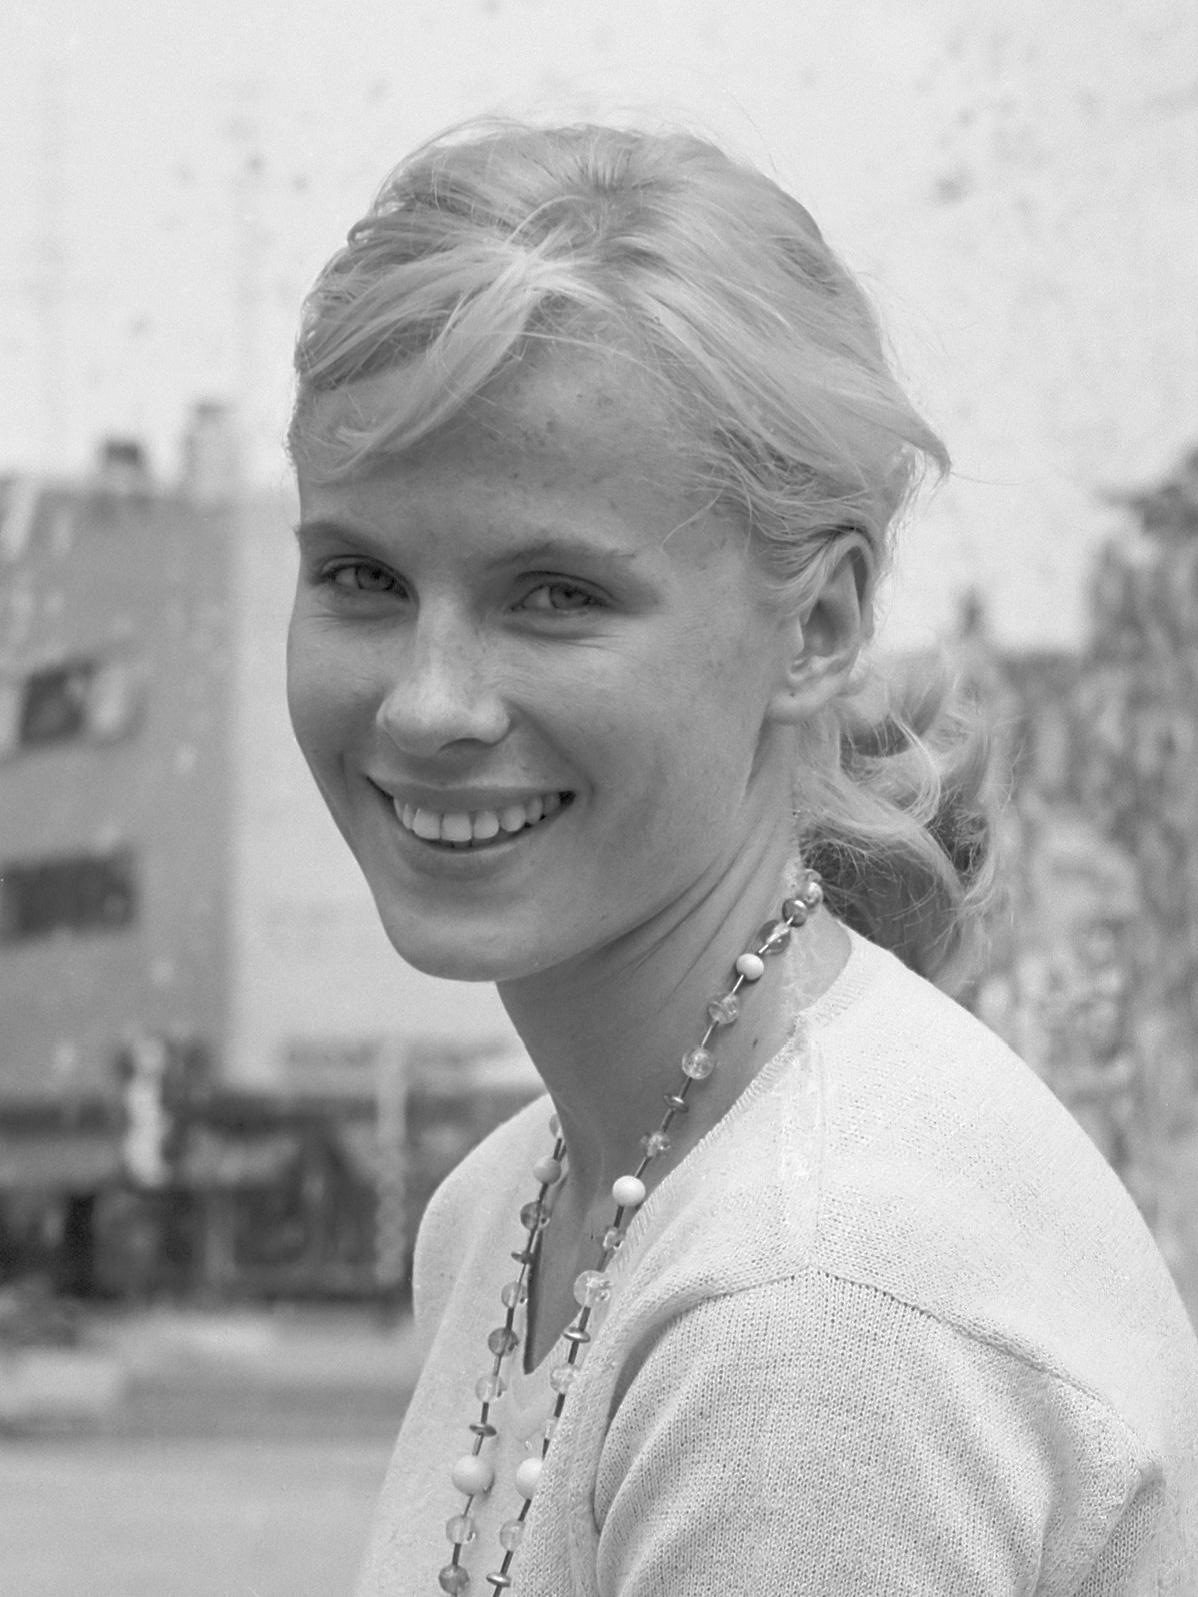 Bibi_Andersson_1961-115615.jpg